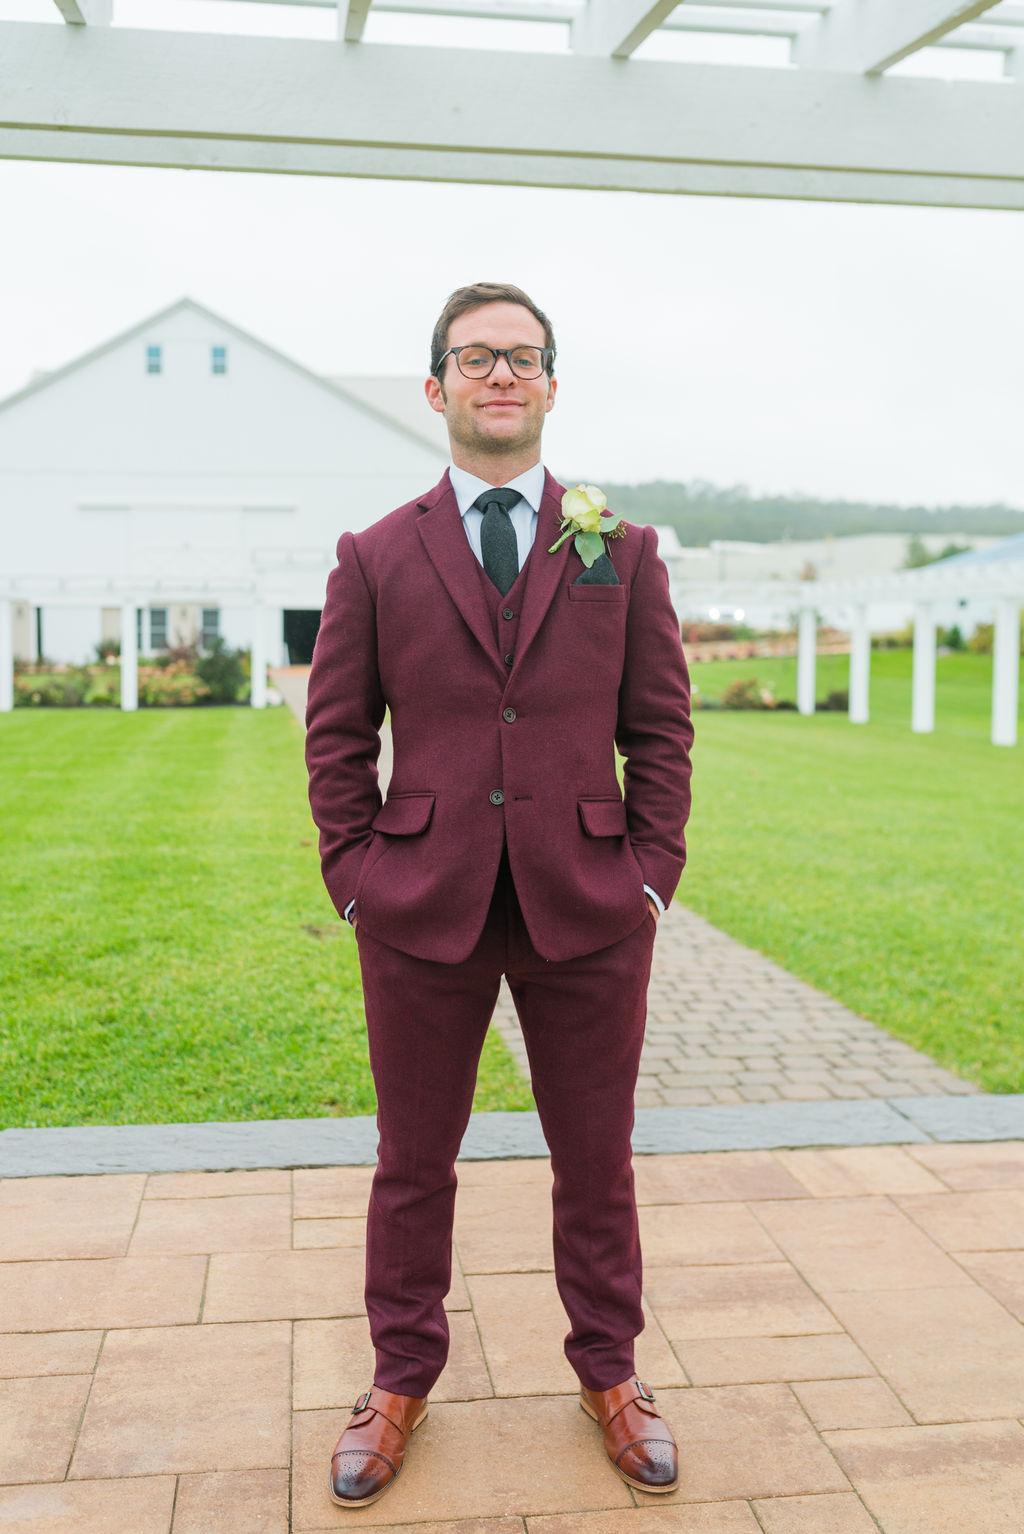 barn-stoneybrooke-JN-pennsylvania-wedding-photographer-126.jpg